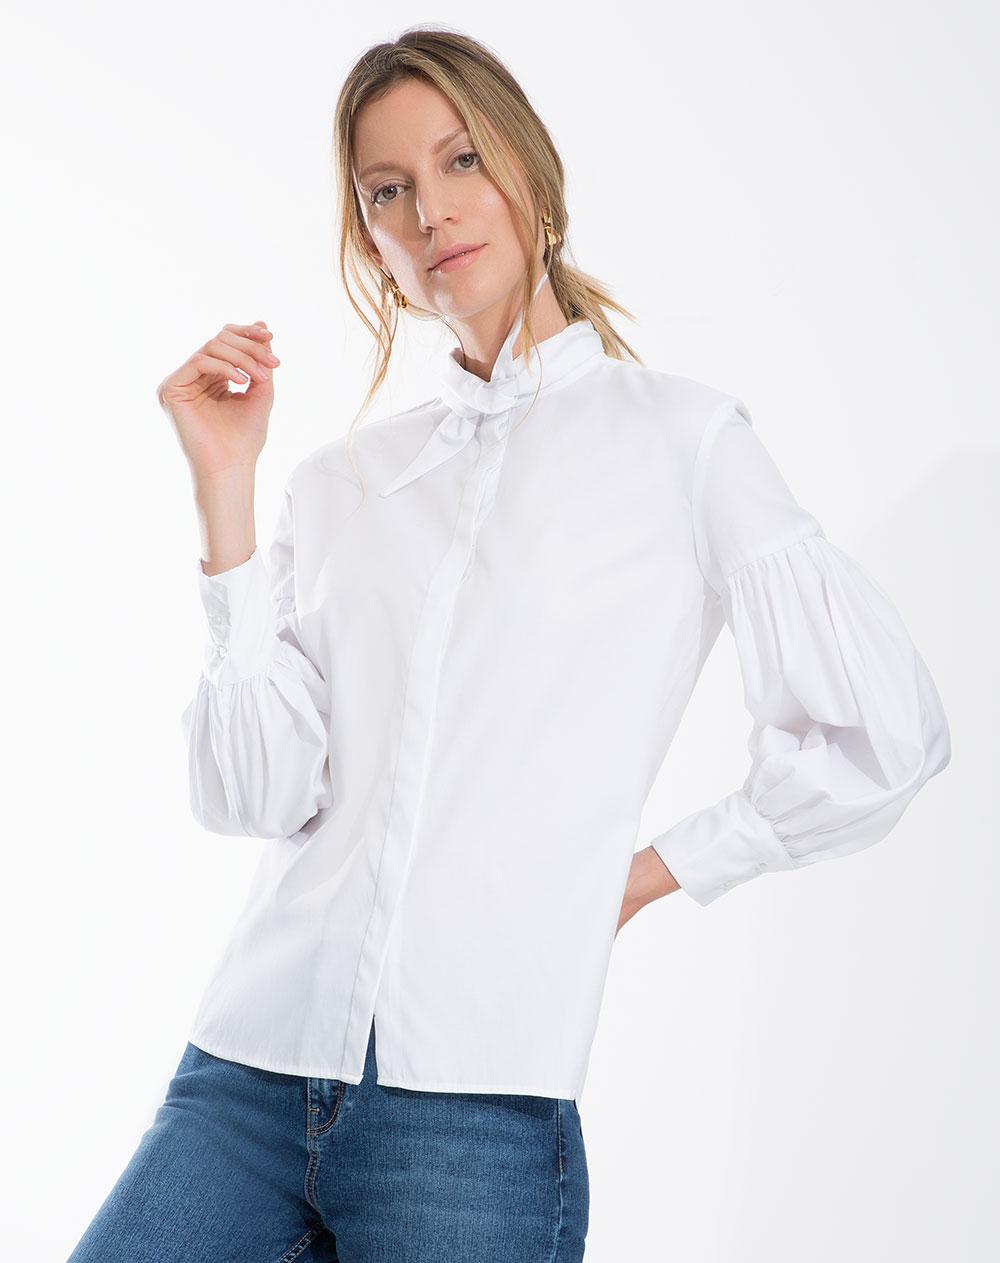 f2ec7467943e Camisa de Mujer Adallia Blanca Mangas Amplias Punto Blanco